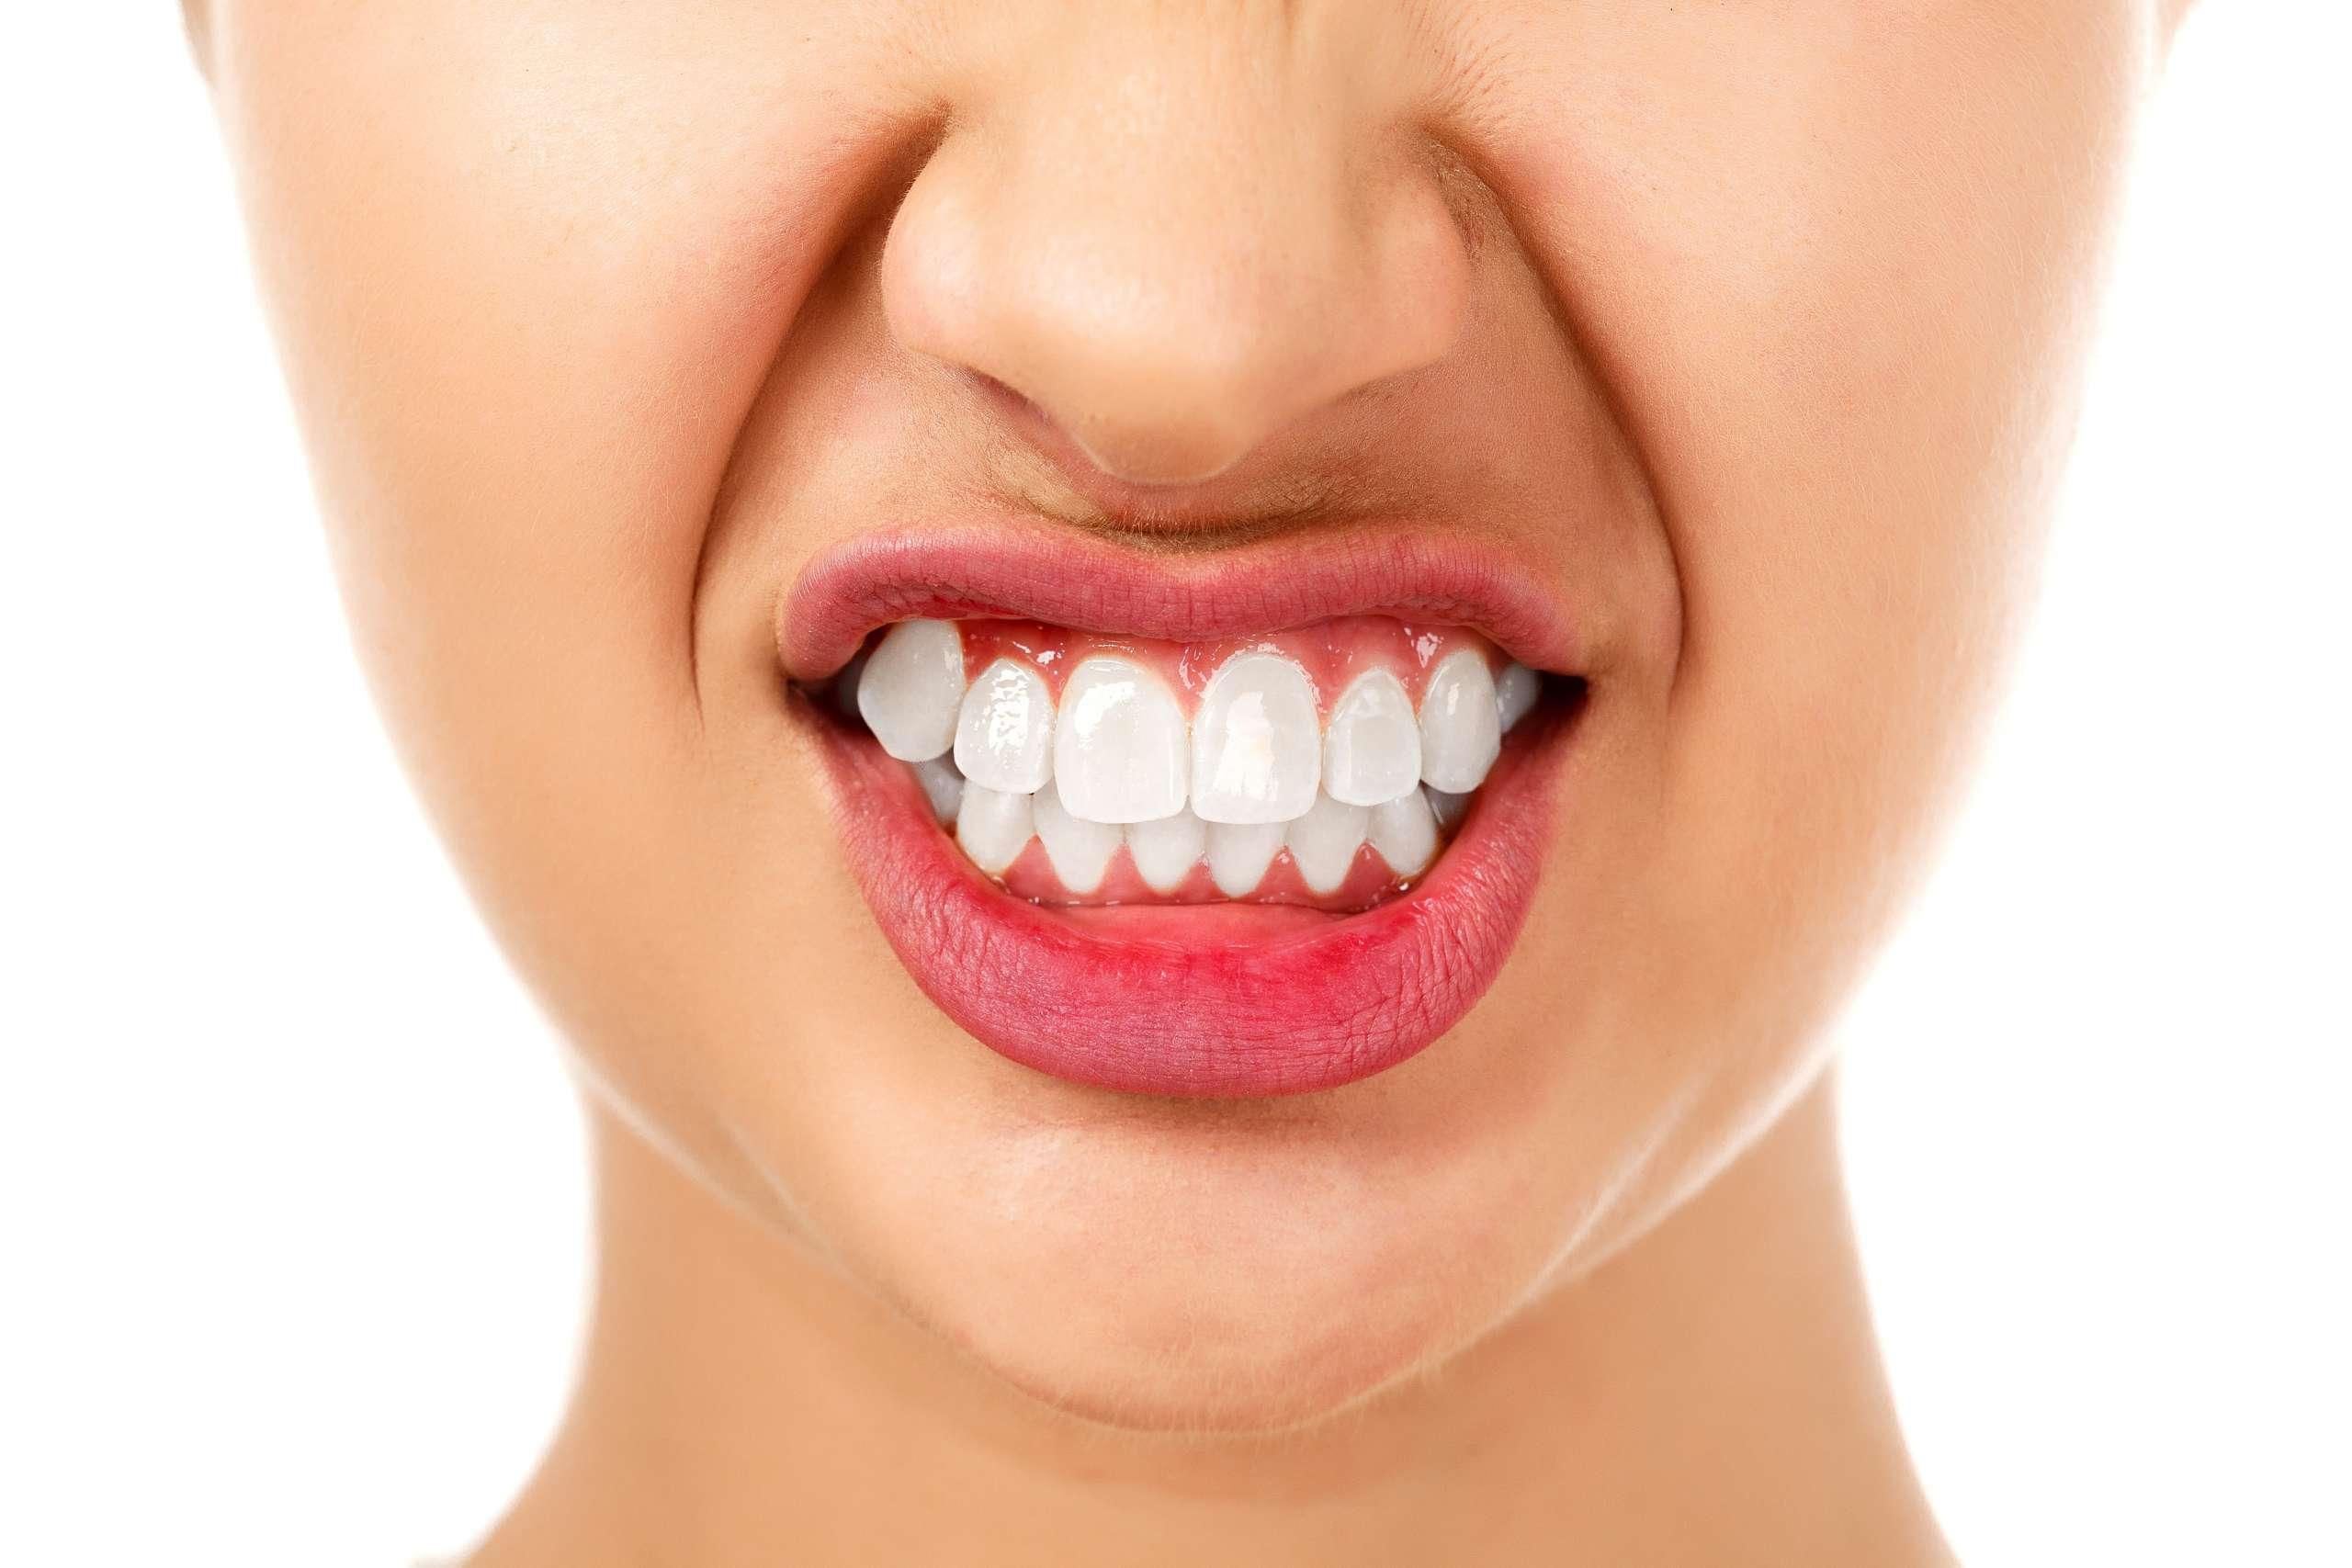 teeth-grinding-winnipeg-dental-clinic-1